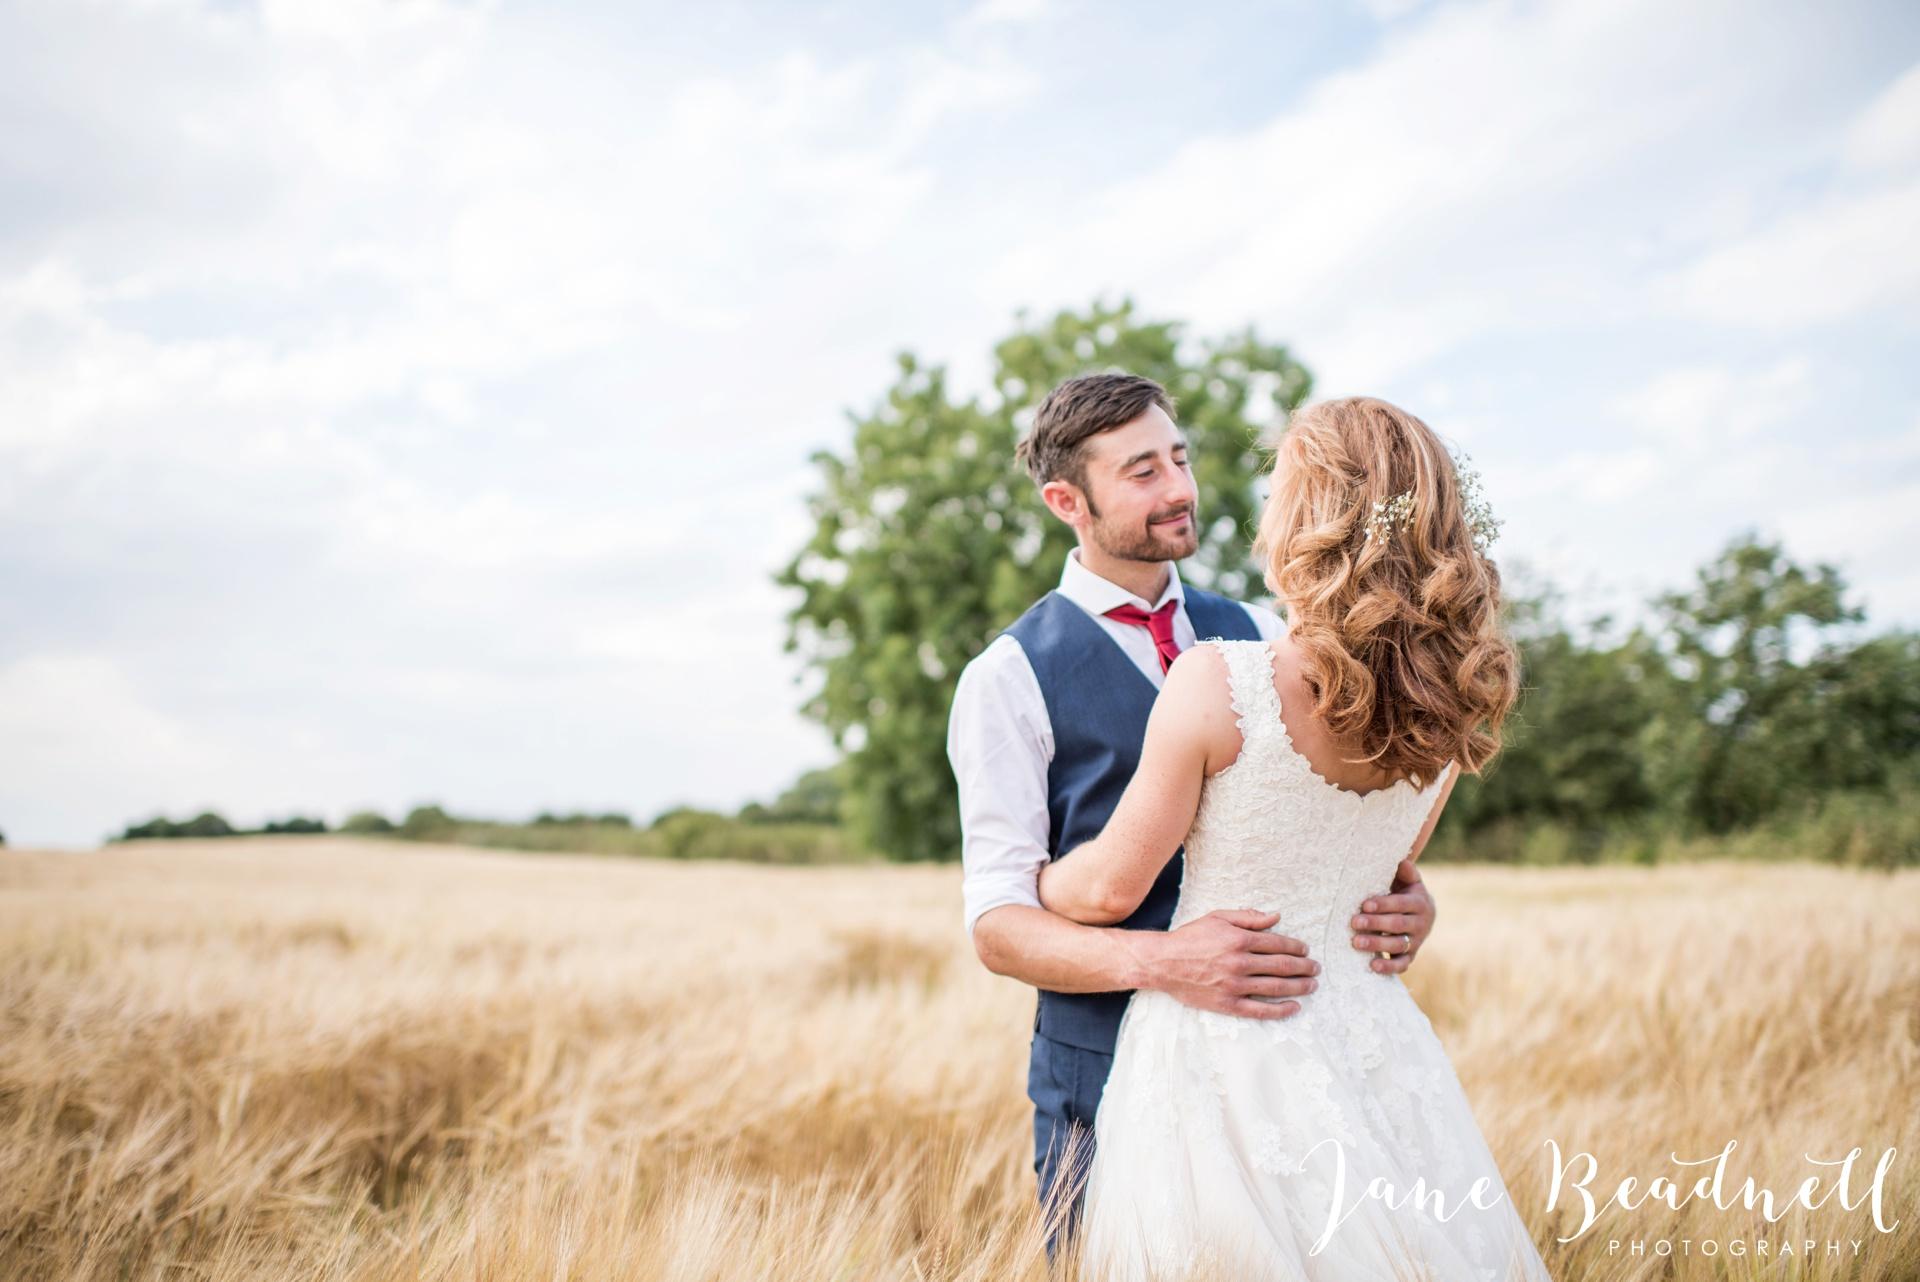 yorkshire-fine-art-wedding-photographer-jane-beadnell-photography-poppleton-york_0127